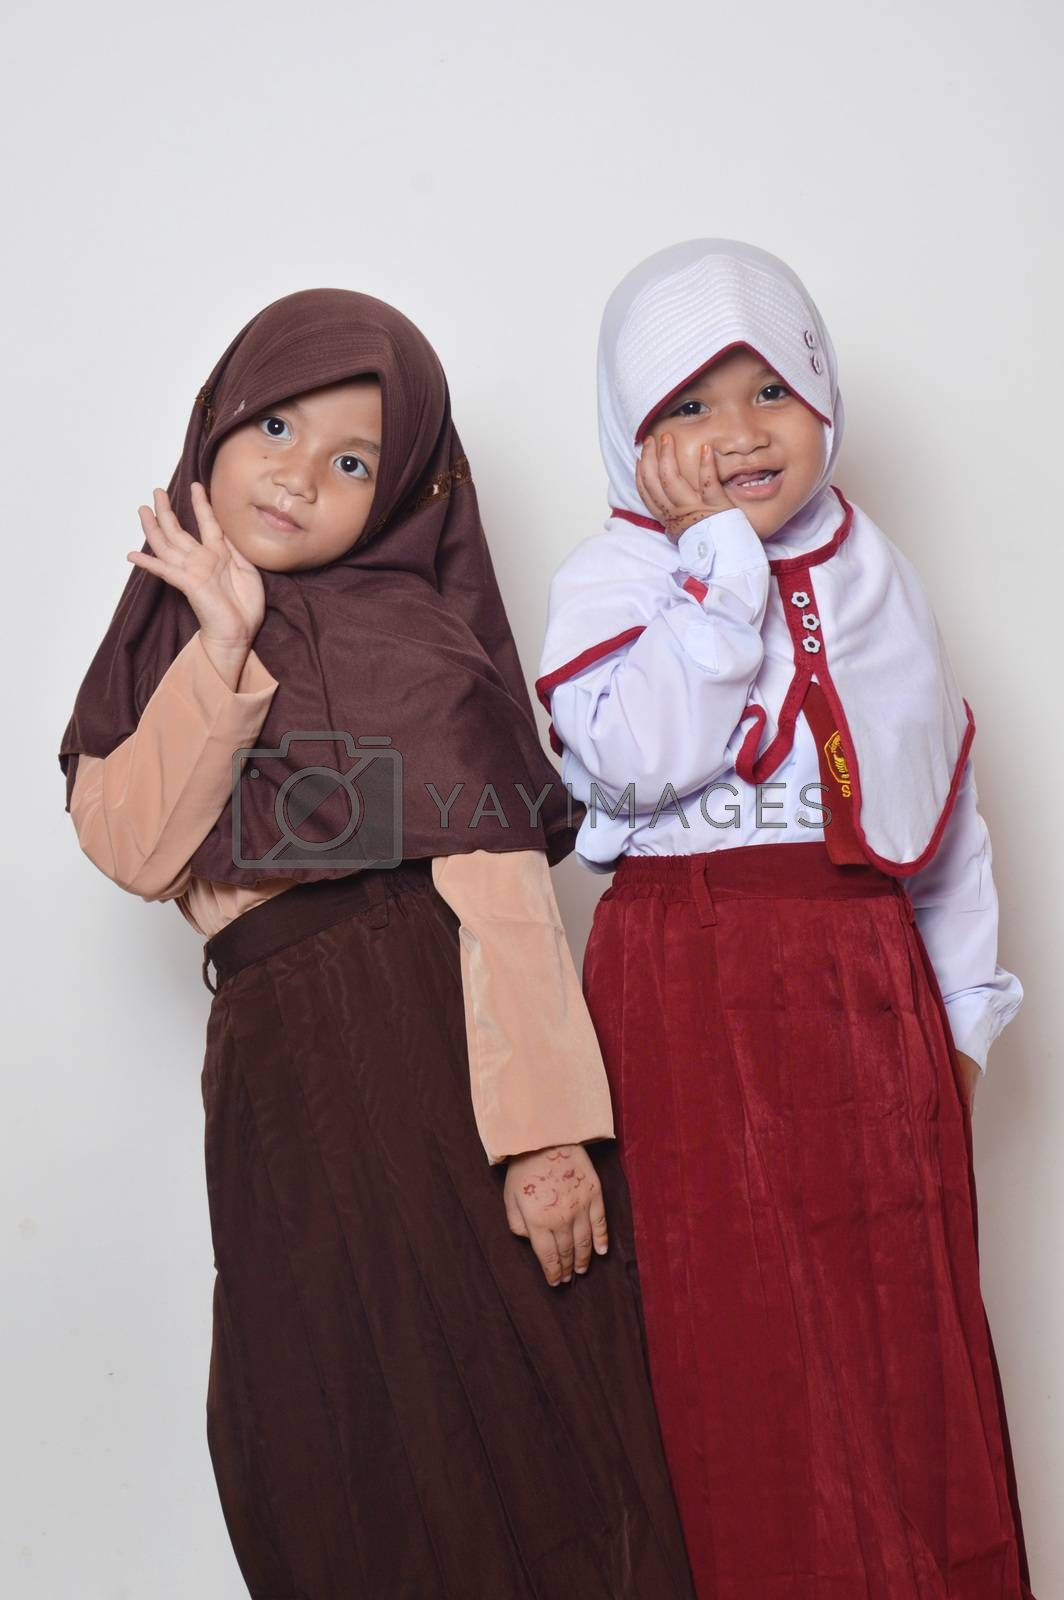 asian little girl by antonihalim